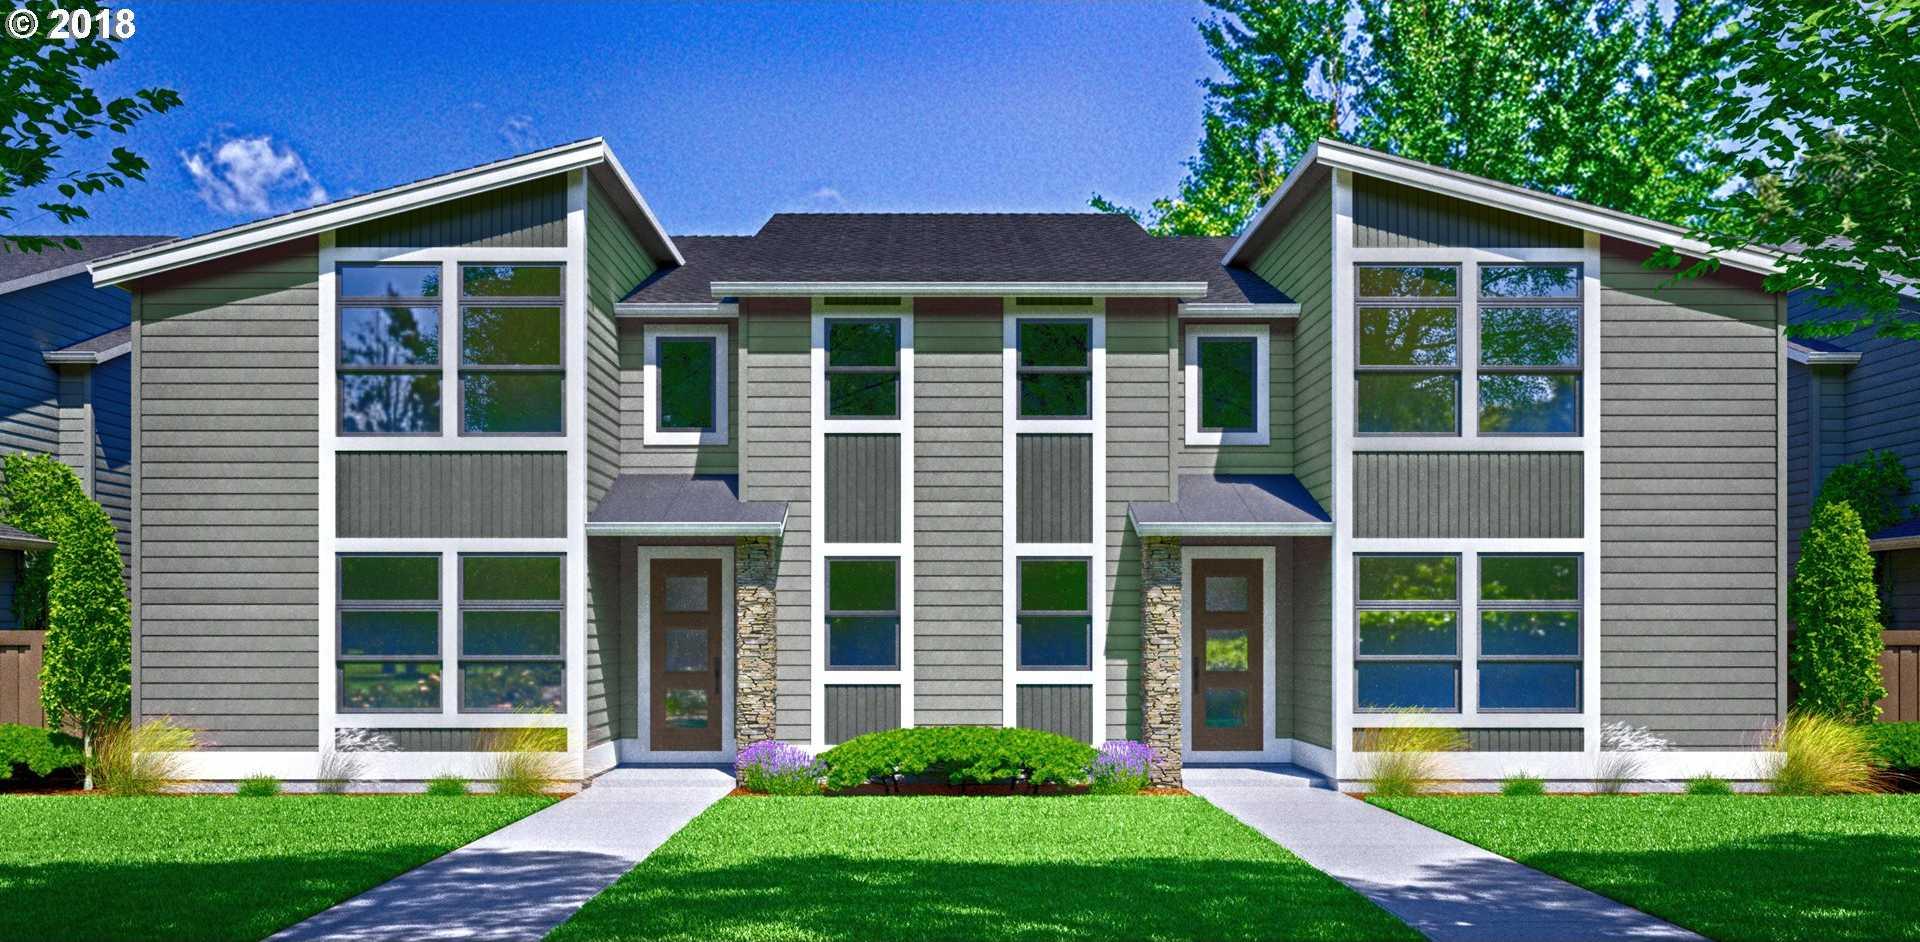 $435,900 - 4Br/3Ba -  for Sale in Hillsboro